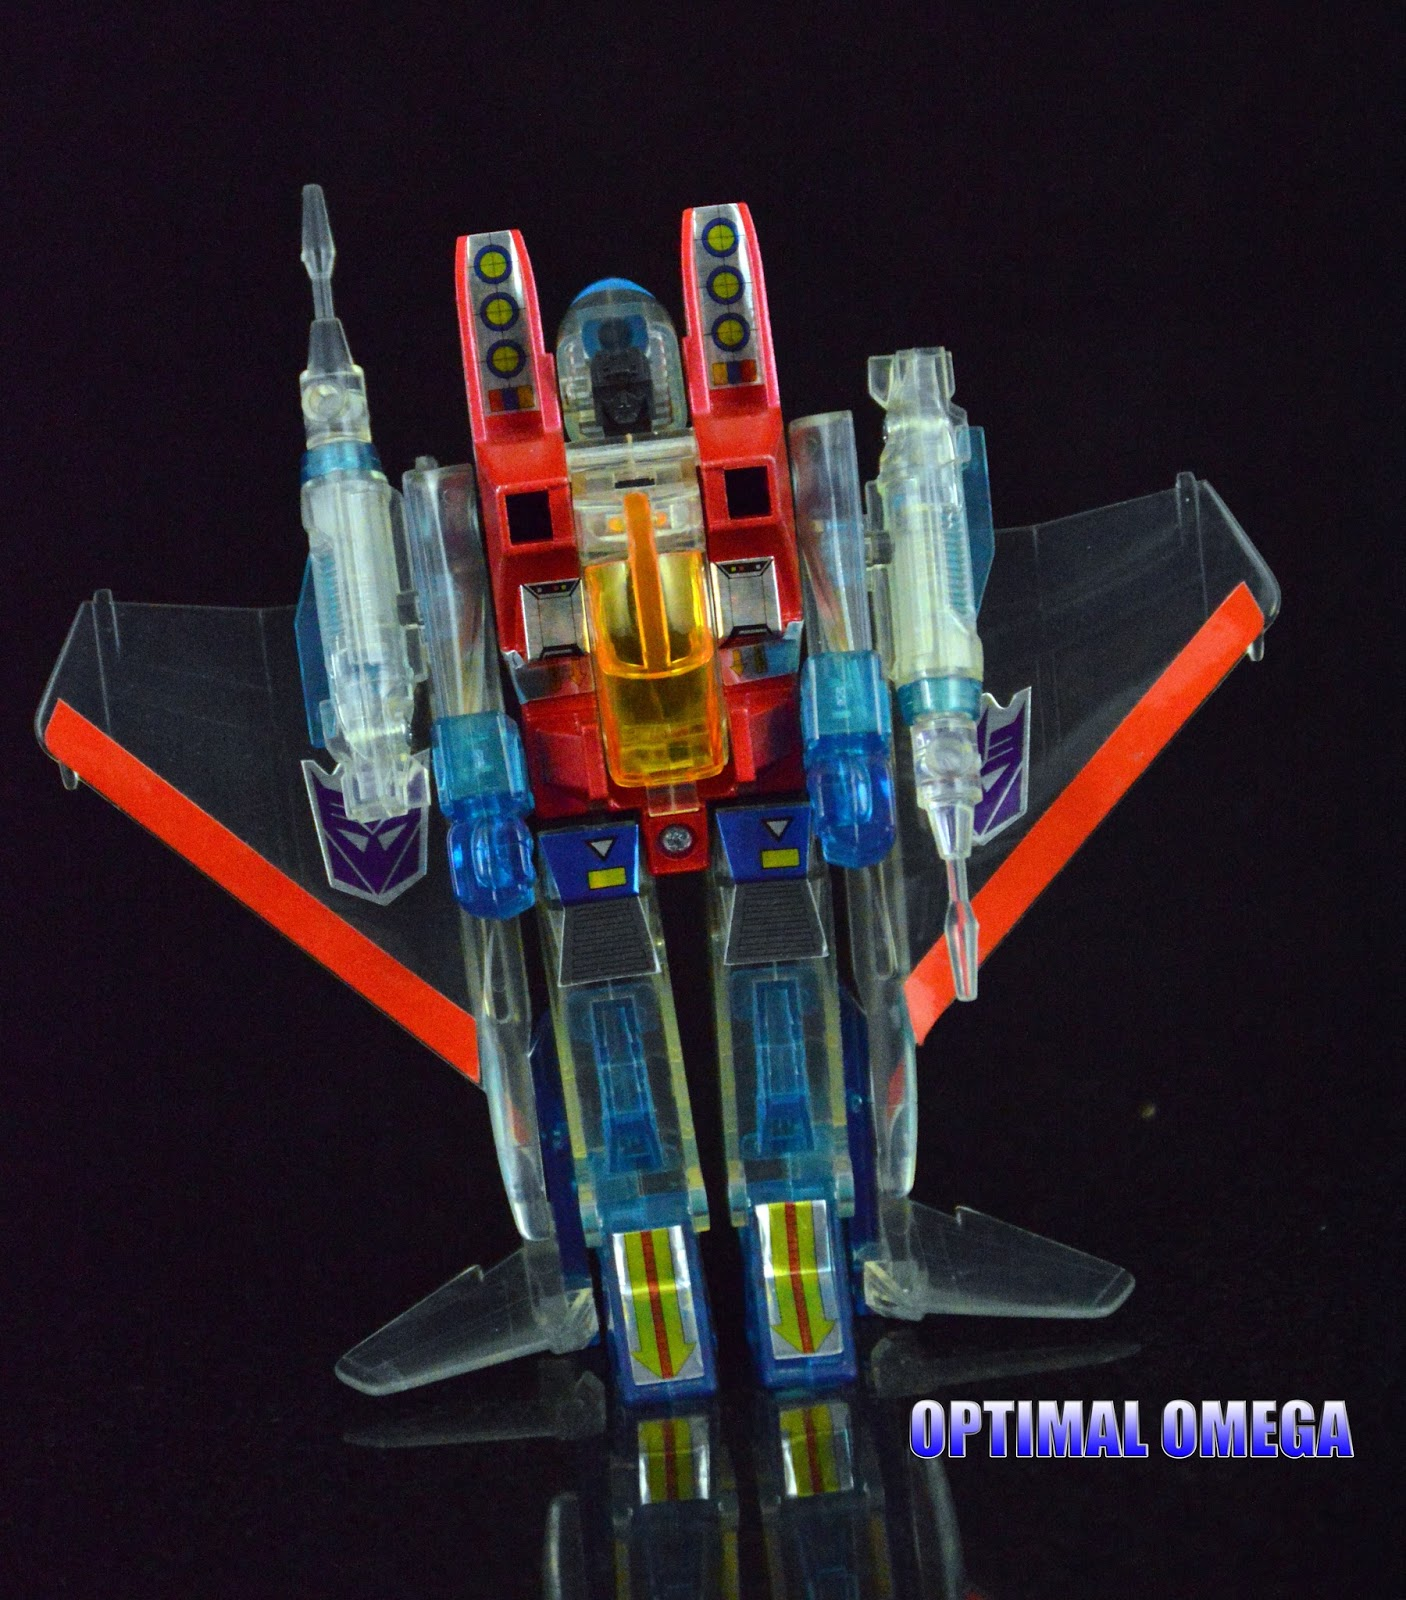 Light Stand Takara Spirit 3: Optimal Omega's Transformers: EHobby Ghost Starscream